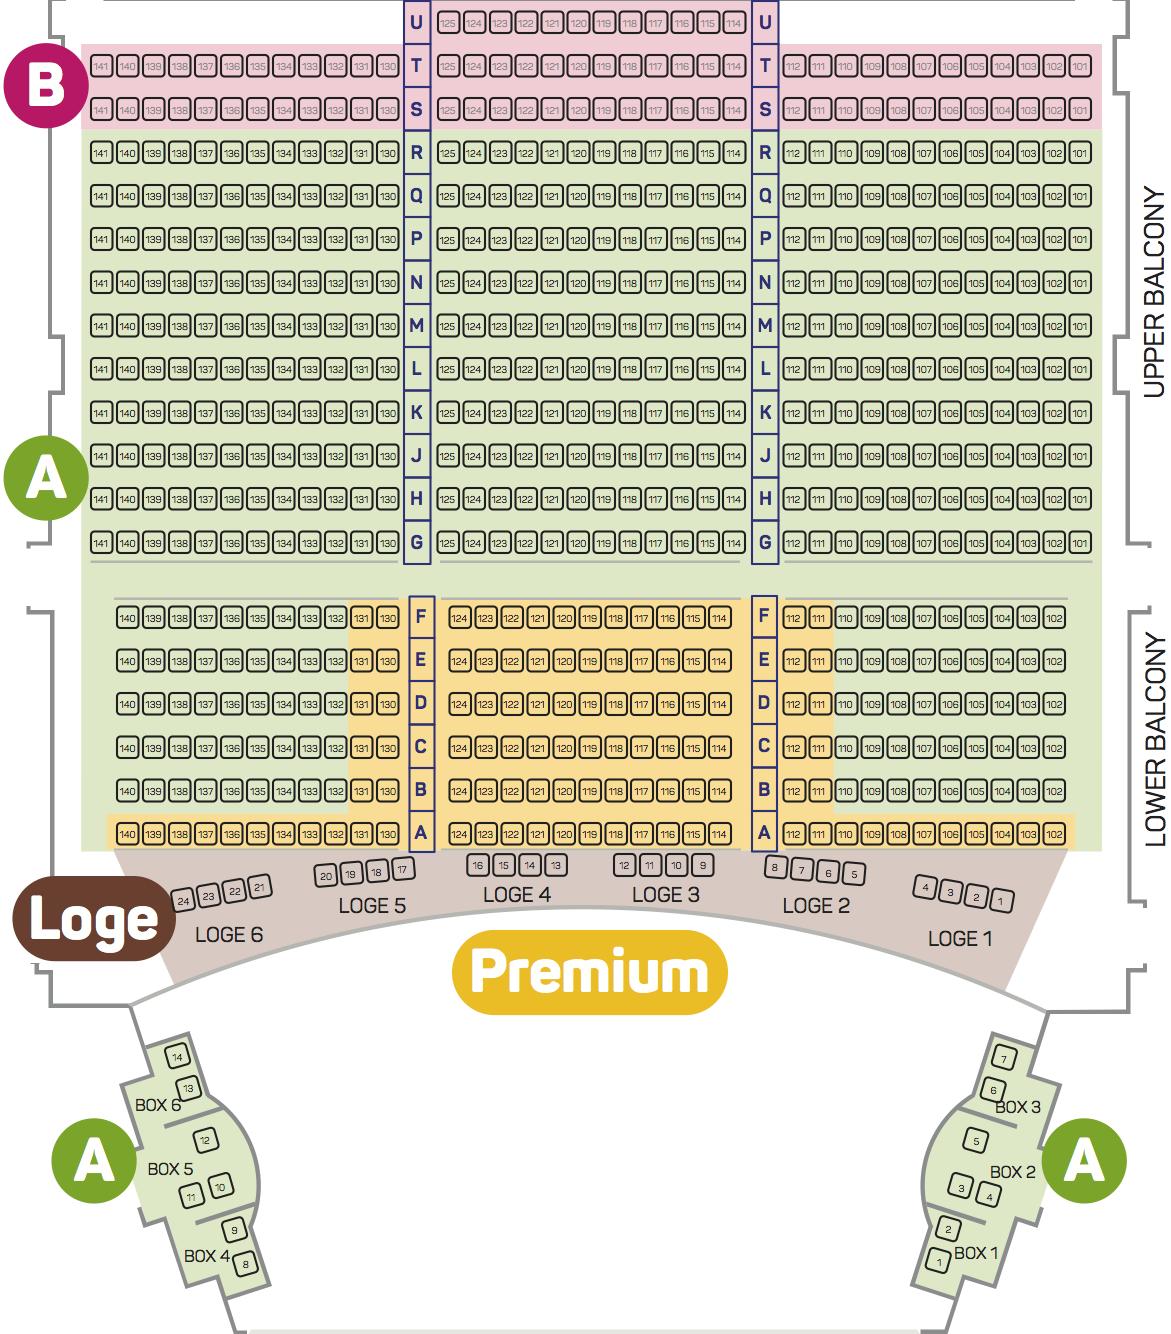 Nutcracker Seating Plan 2018 - Balcony